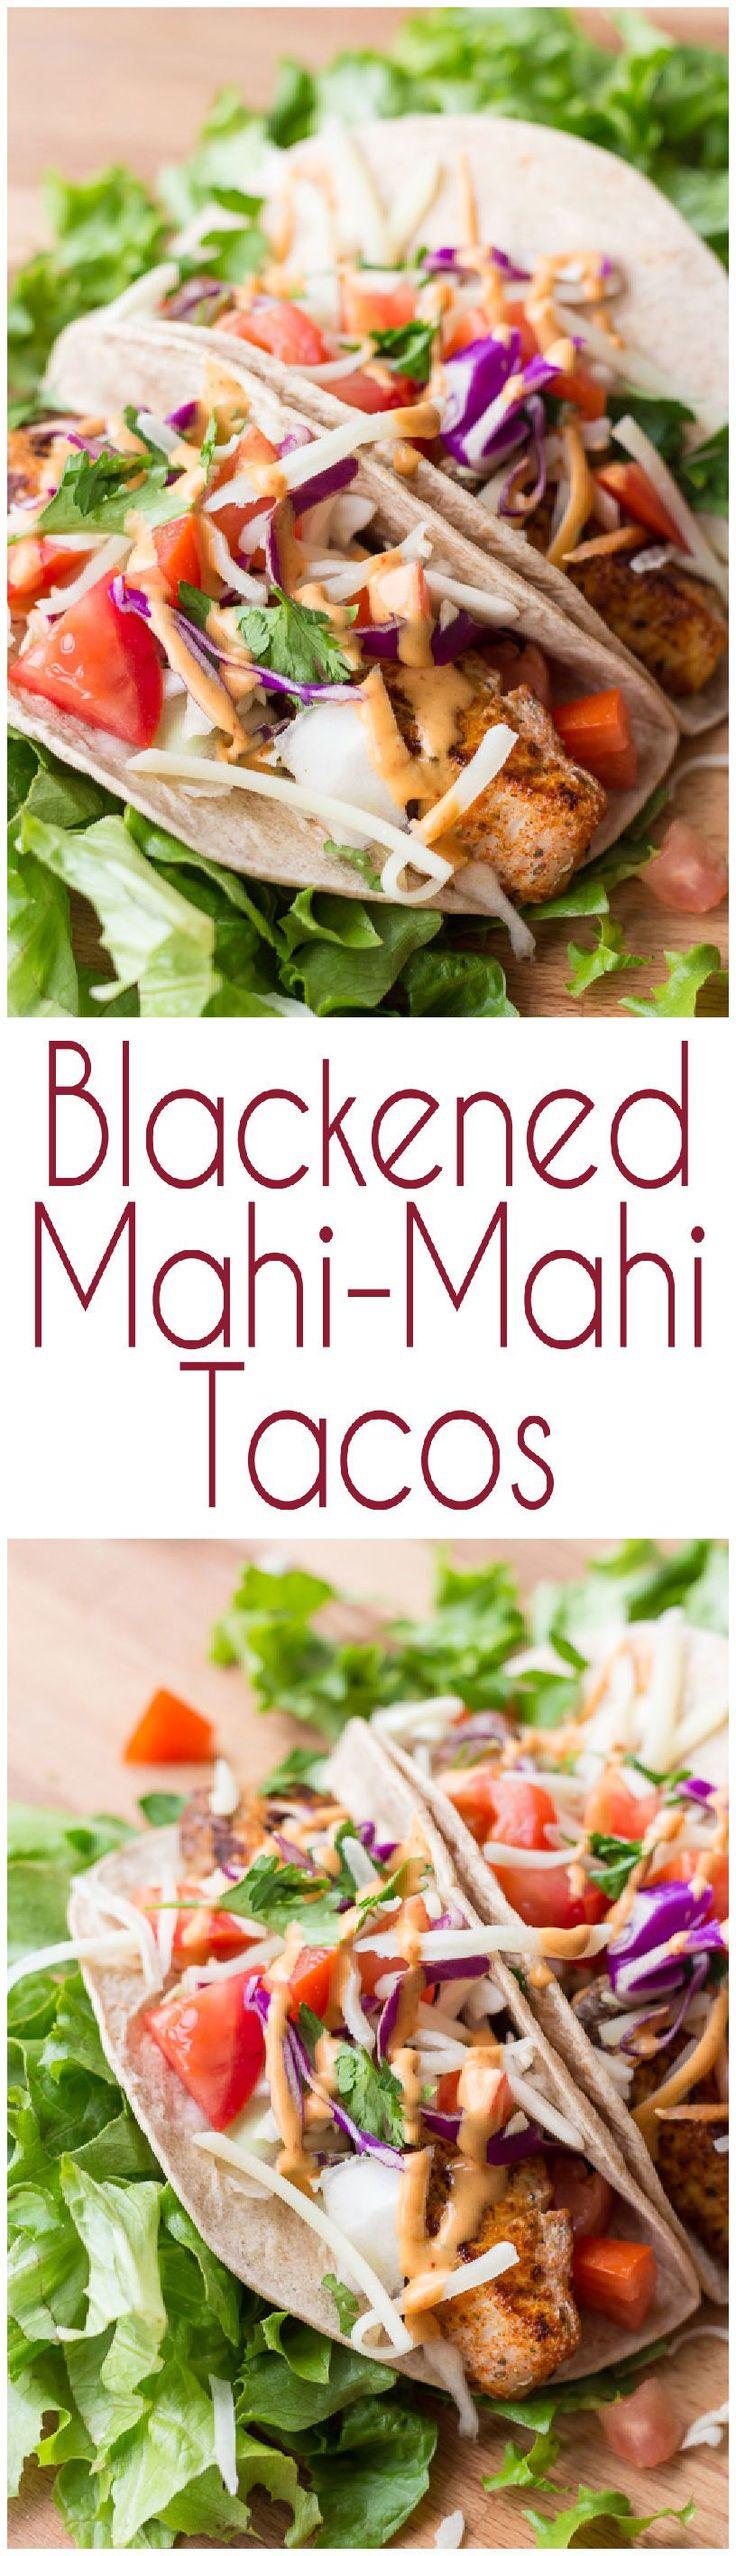 Blackened Mahi-Mahi Tacos with a Chipotle Mayo - The Table